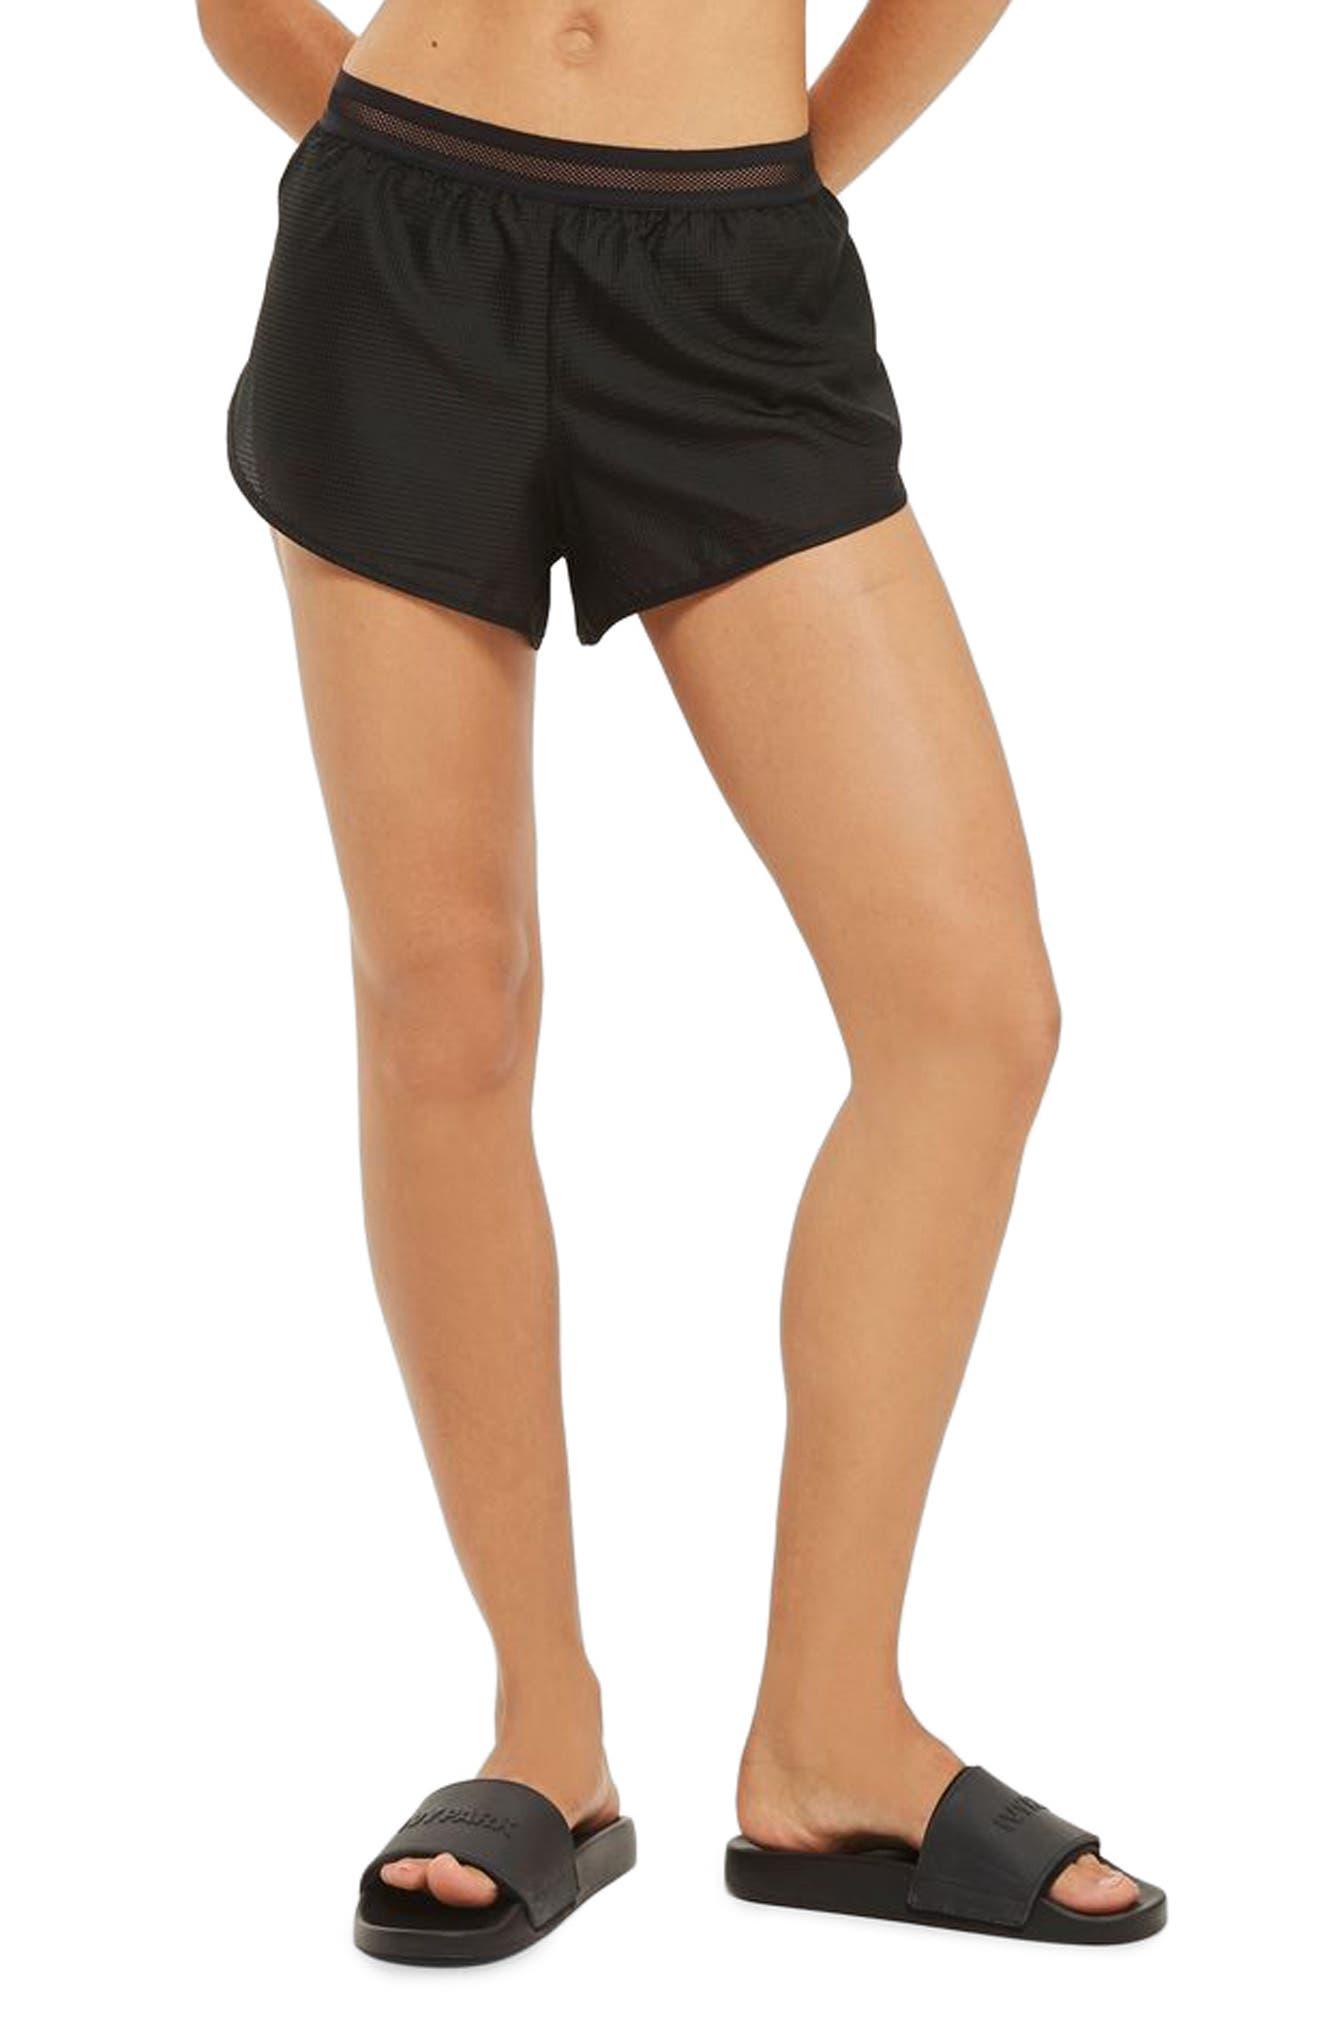 Main Image - IVY PARK® Logo Perforated Runner Shorts